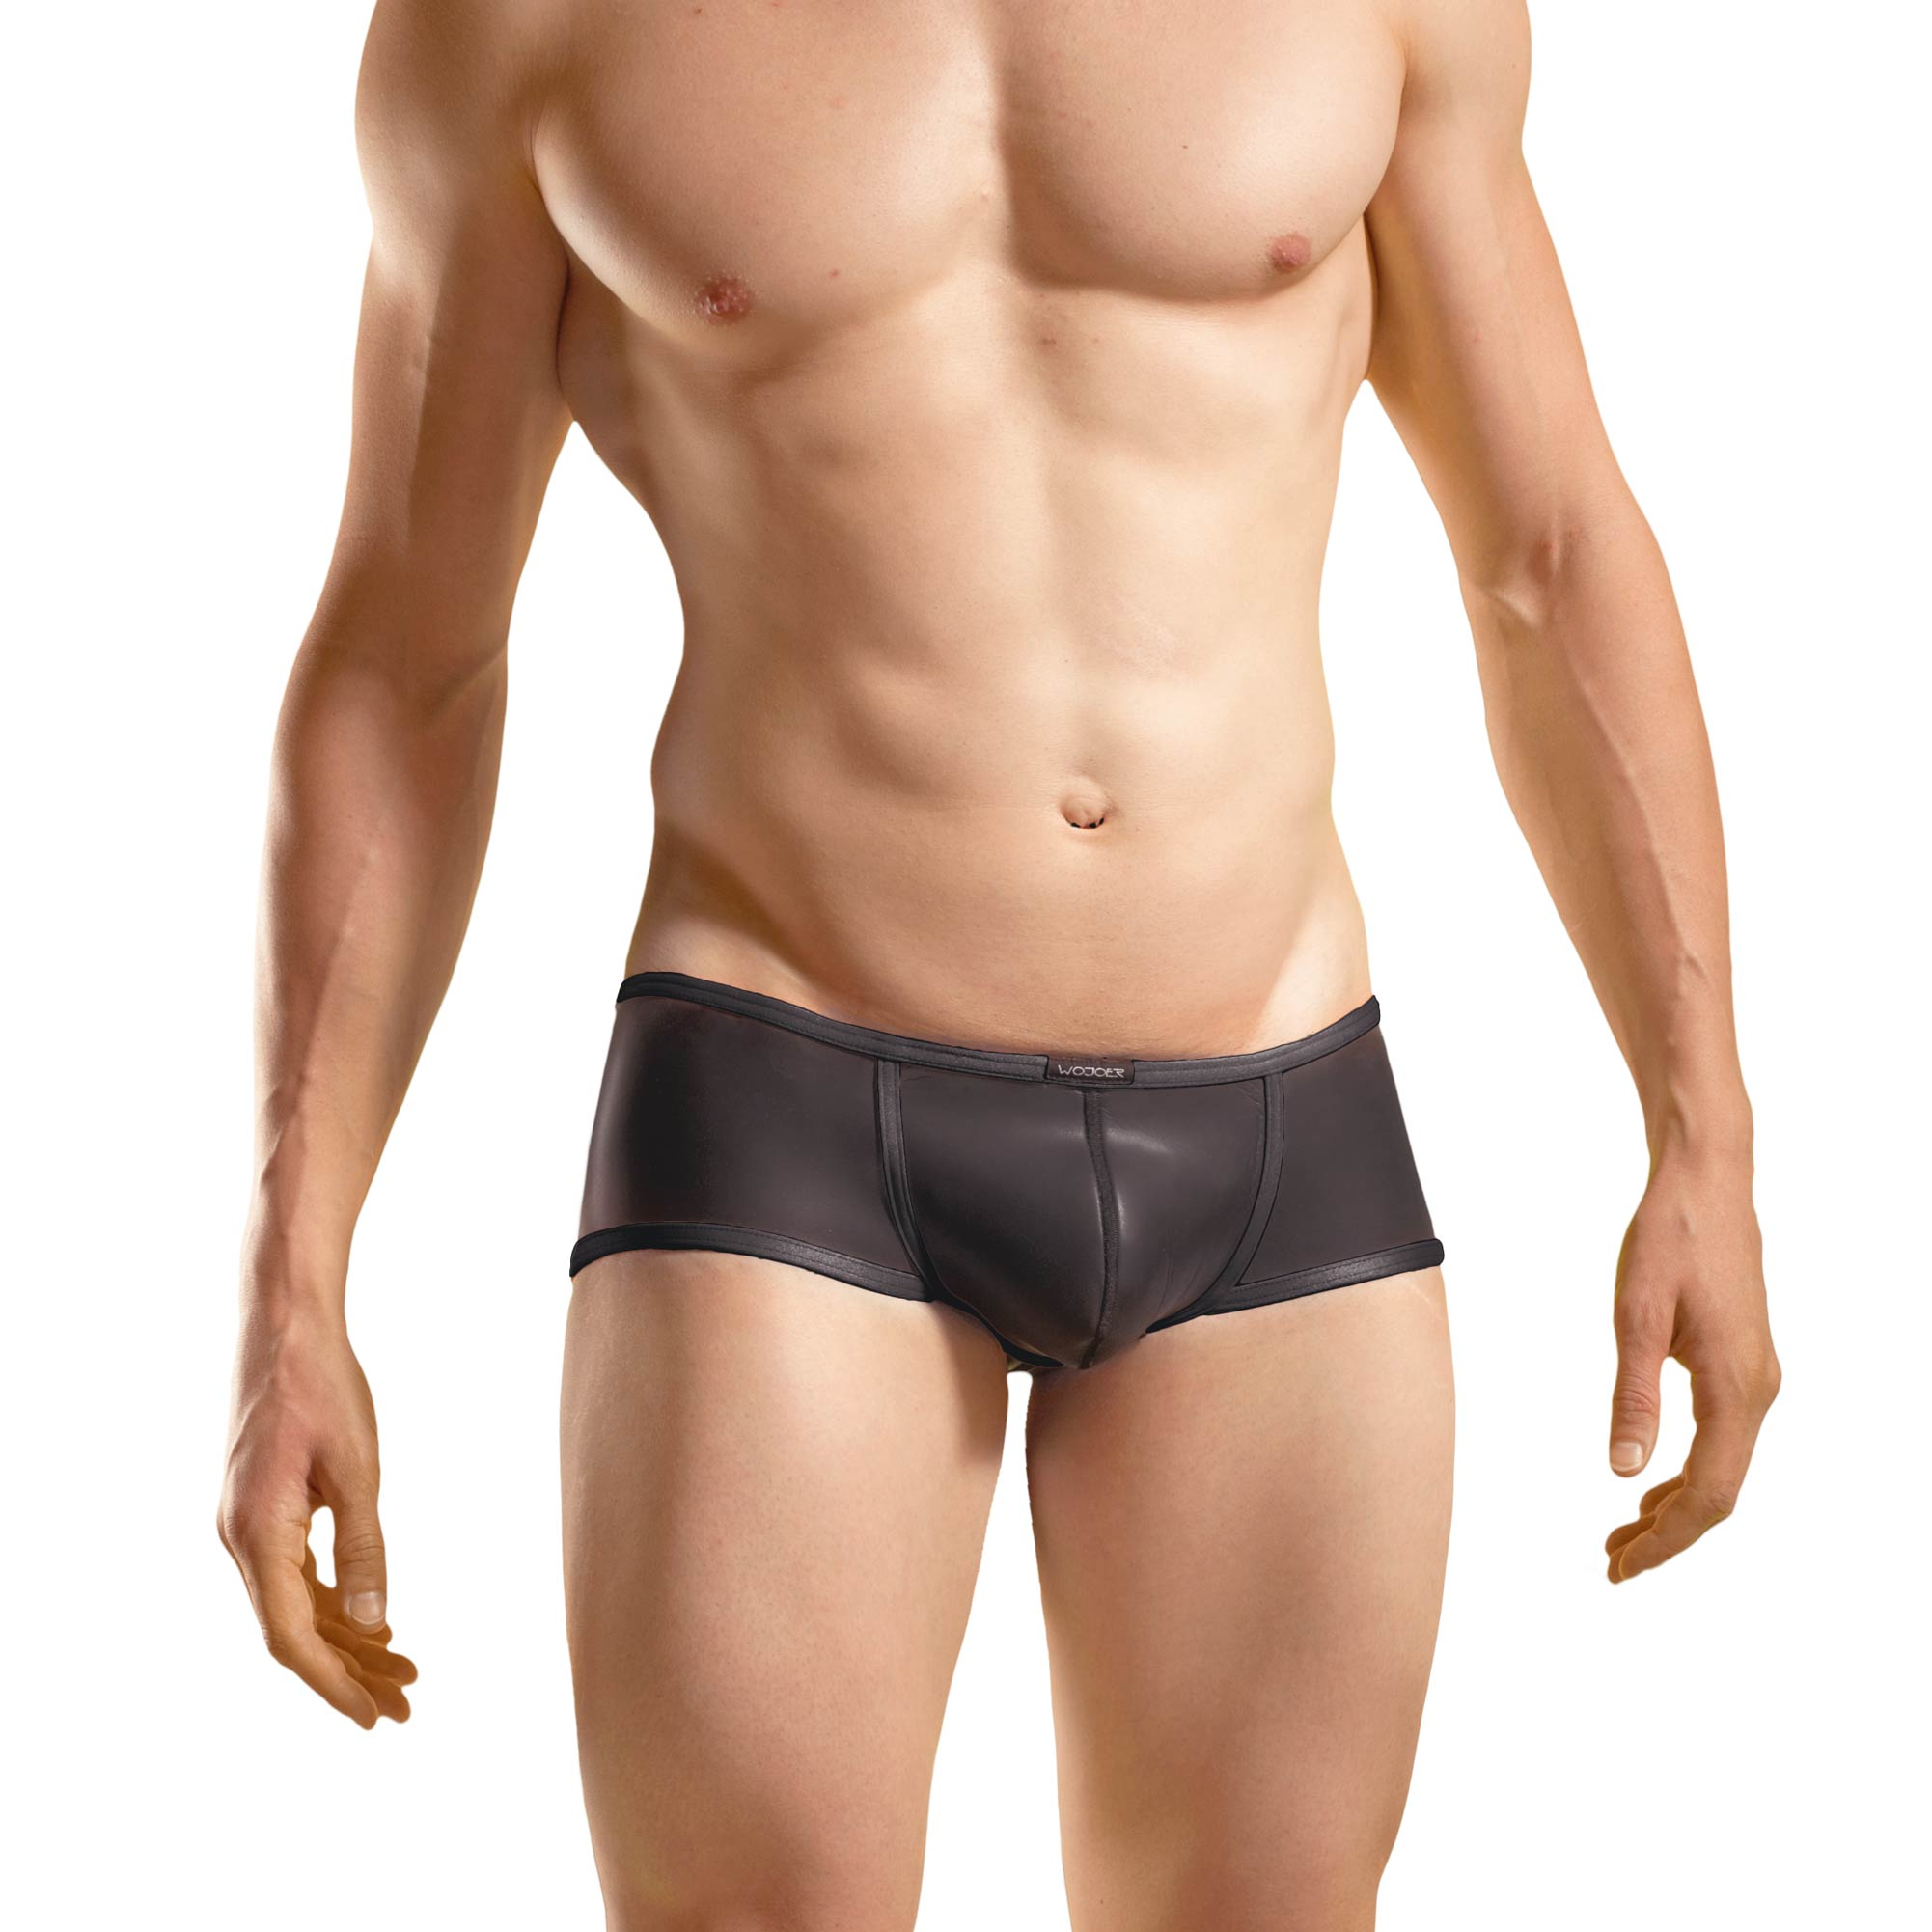 Bade Hipster, Neopren Pant, Glatthautneopren, erotische Badehose, Männer Pants, schwarz